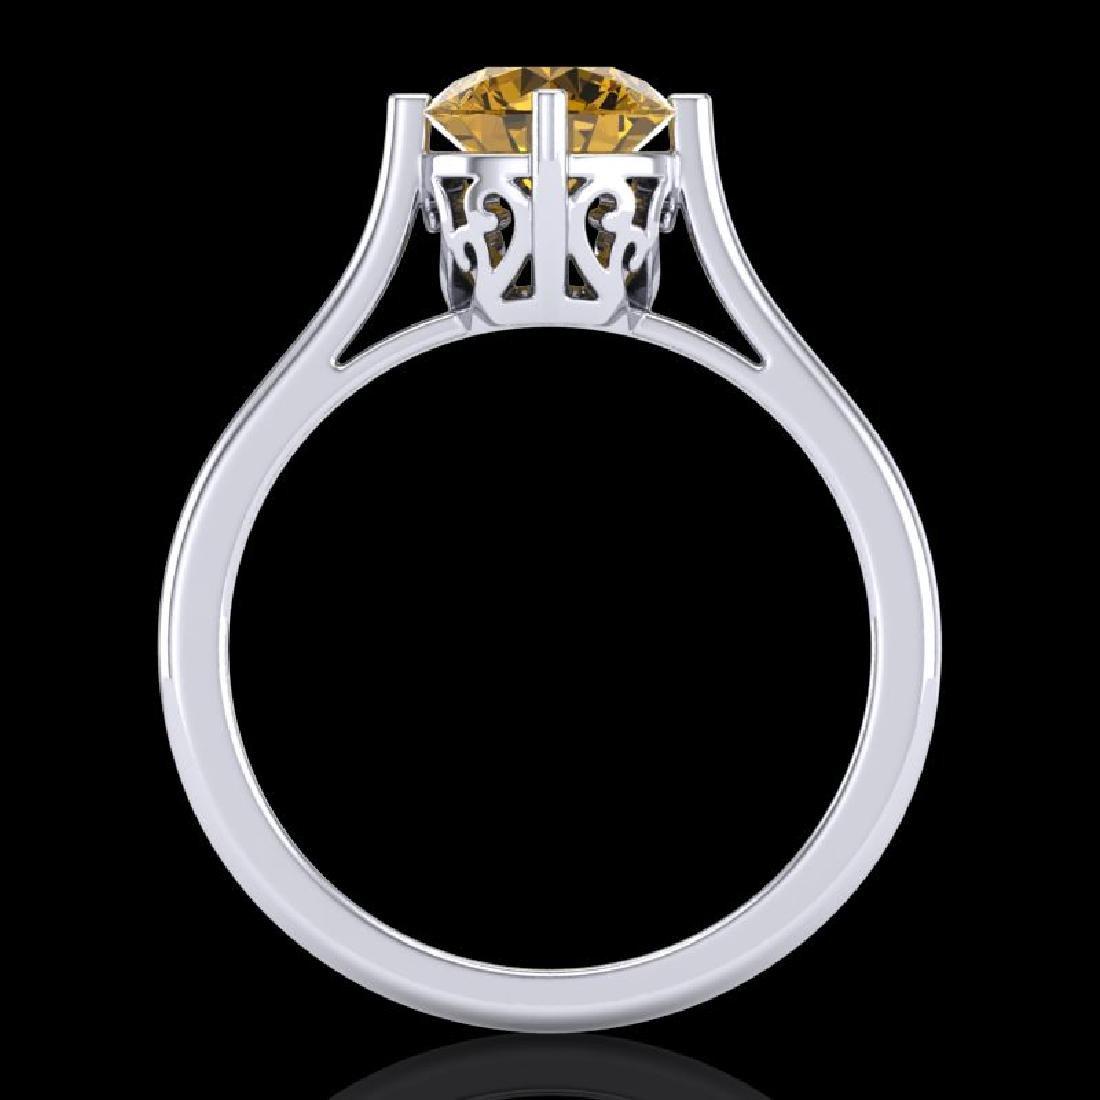 1.25 CTW Intense Fancy Yellow Diamond Engagement Art - 3